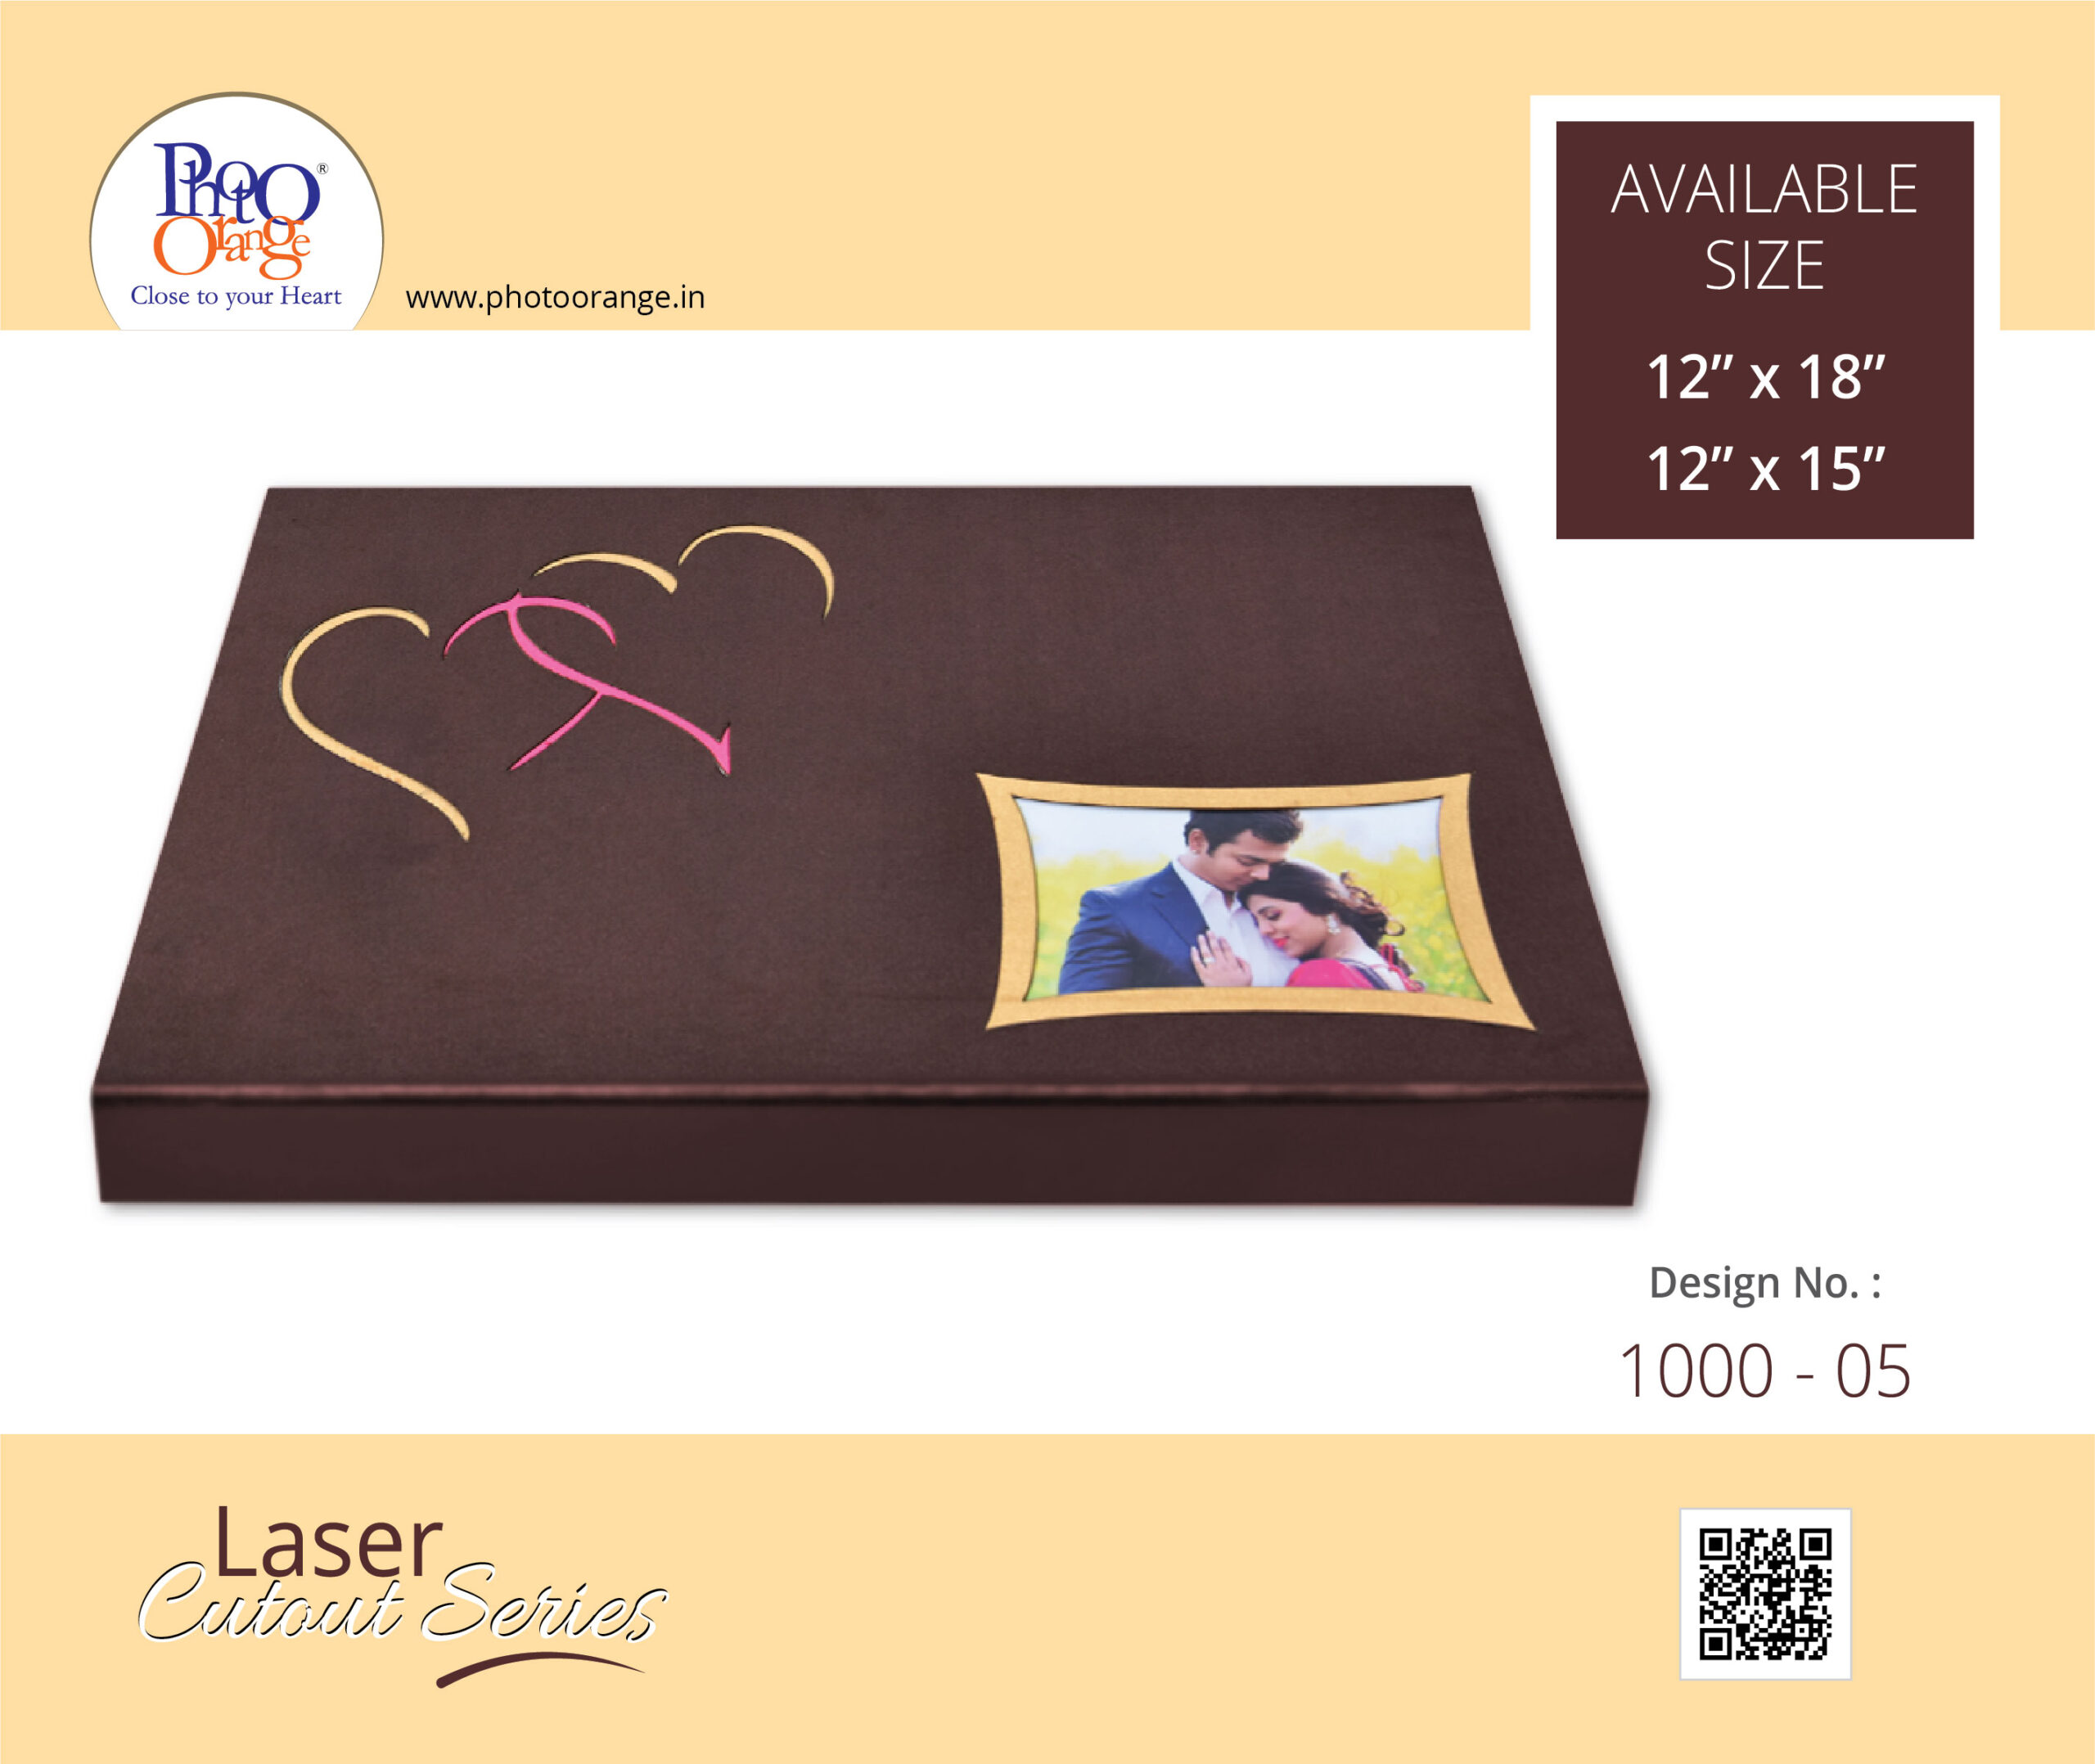 Laser Cutout Series 1000 03